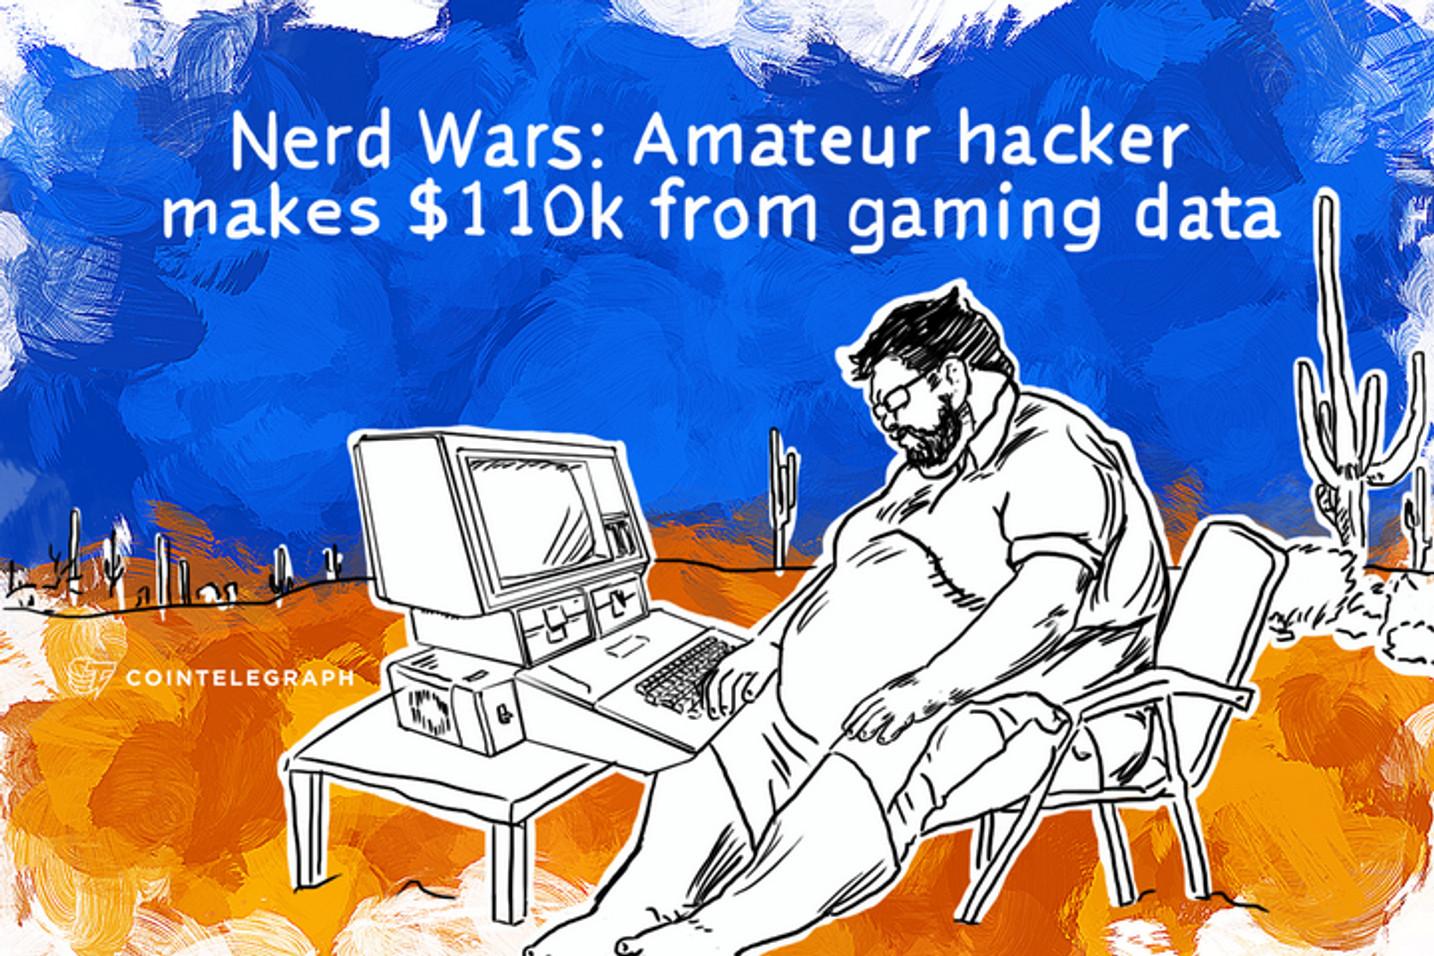 Nerd Wars: Amateur hacker makes $110k from gaming data